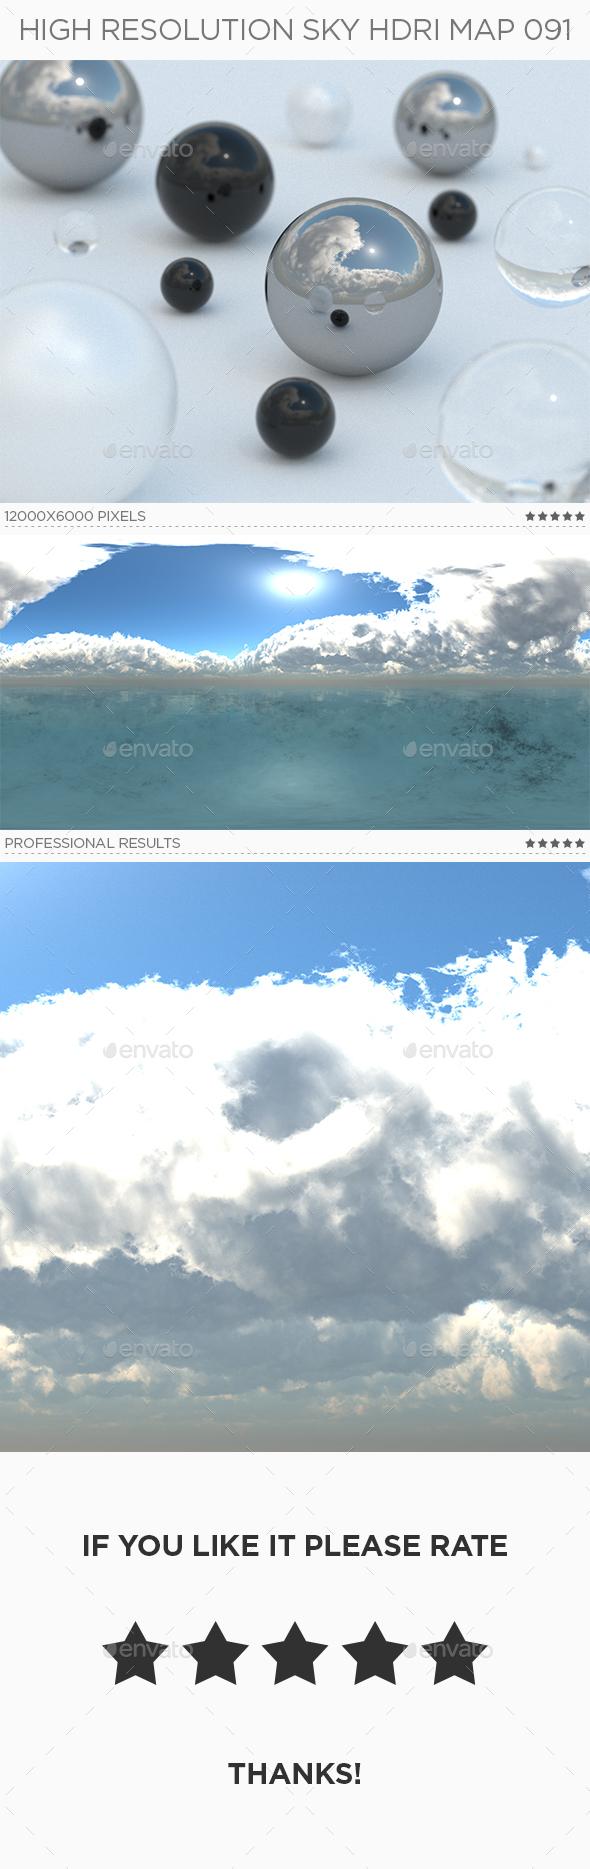 High Resolution Sky HDRi Map 091 - 3DOcean Item for Sale